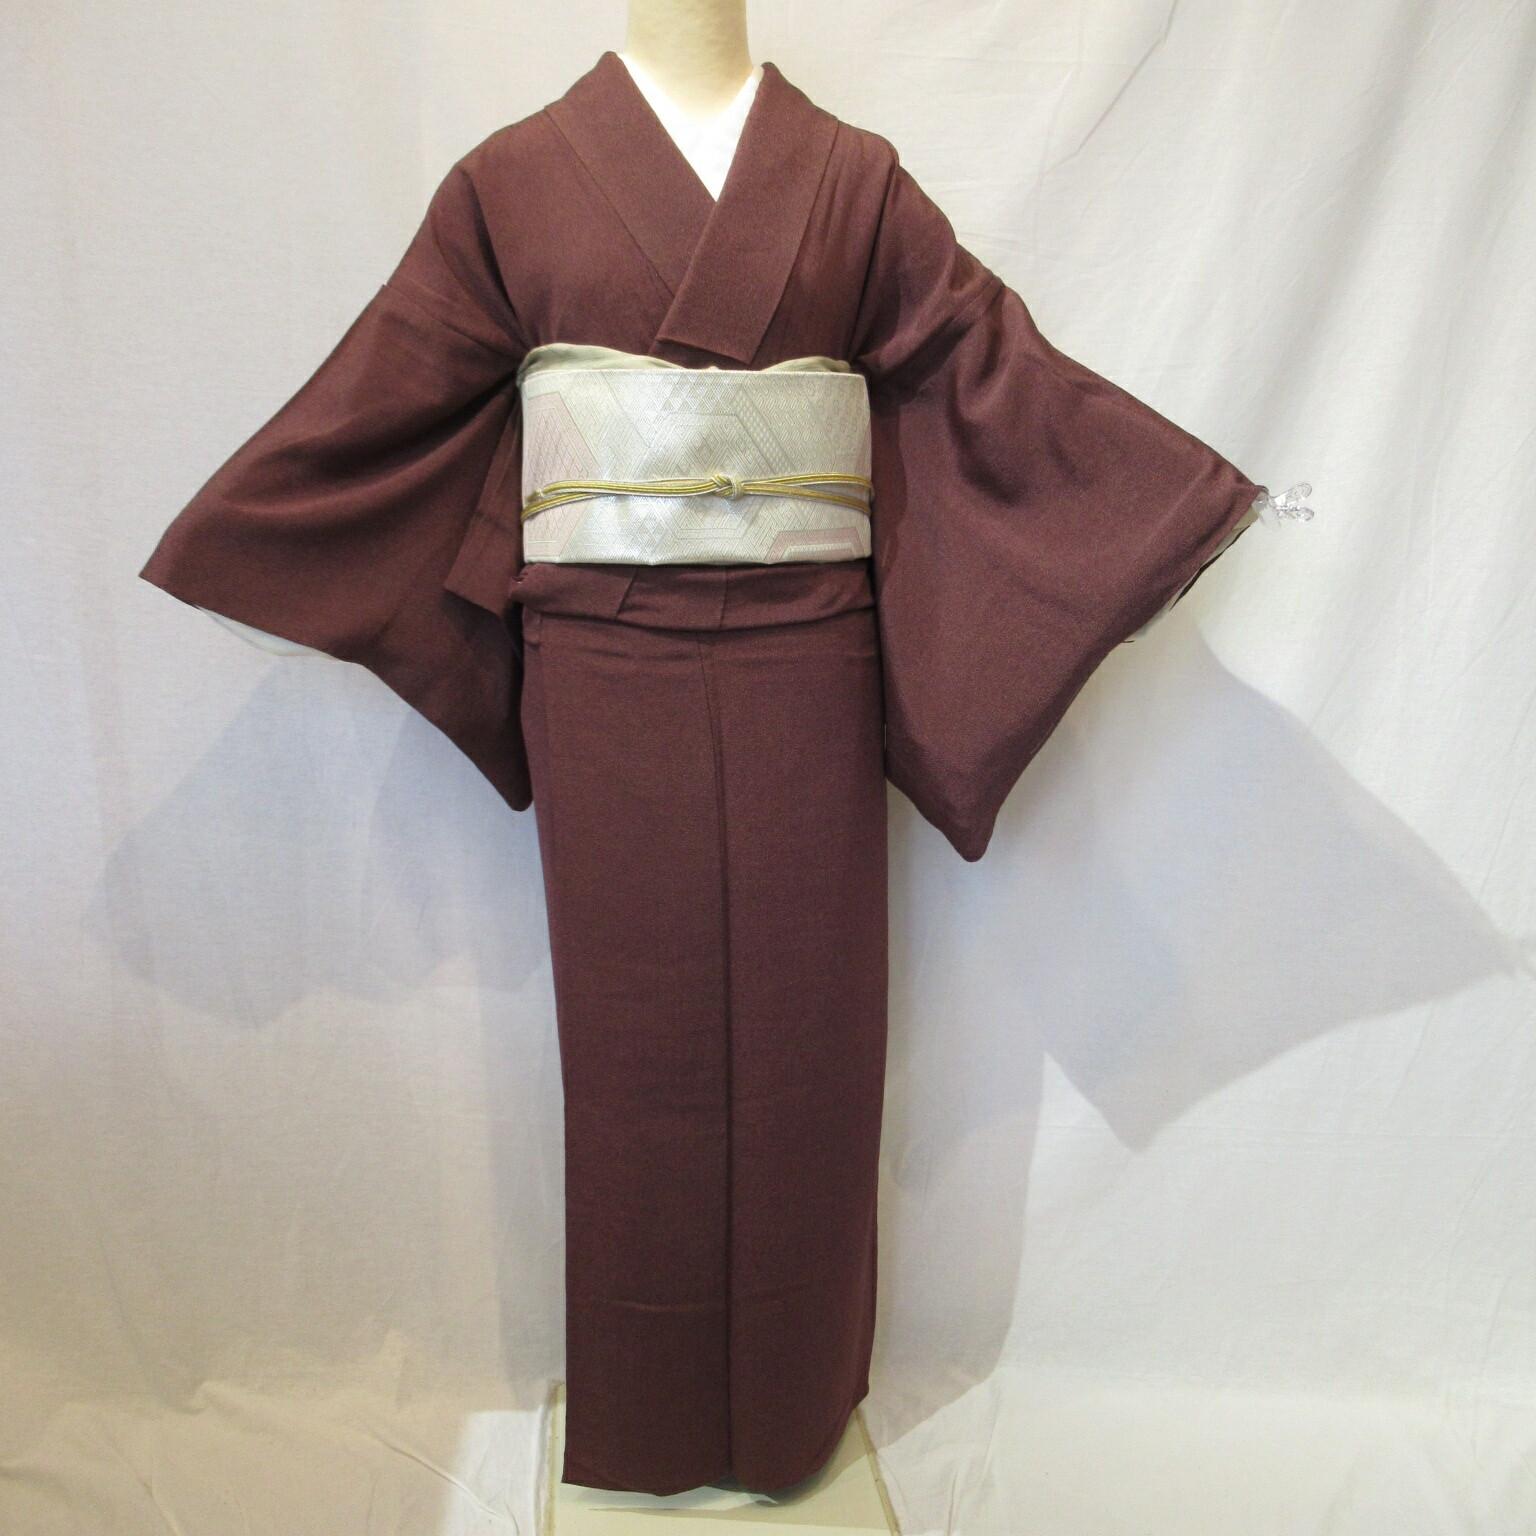 夏用単衣江戸小紋1445と佐賀錦袋帯4点セット